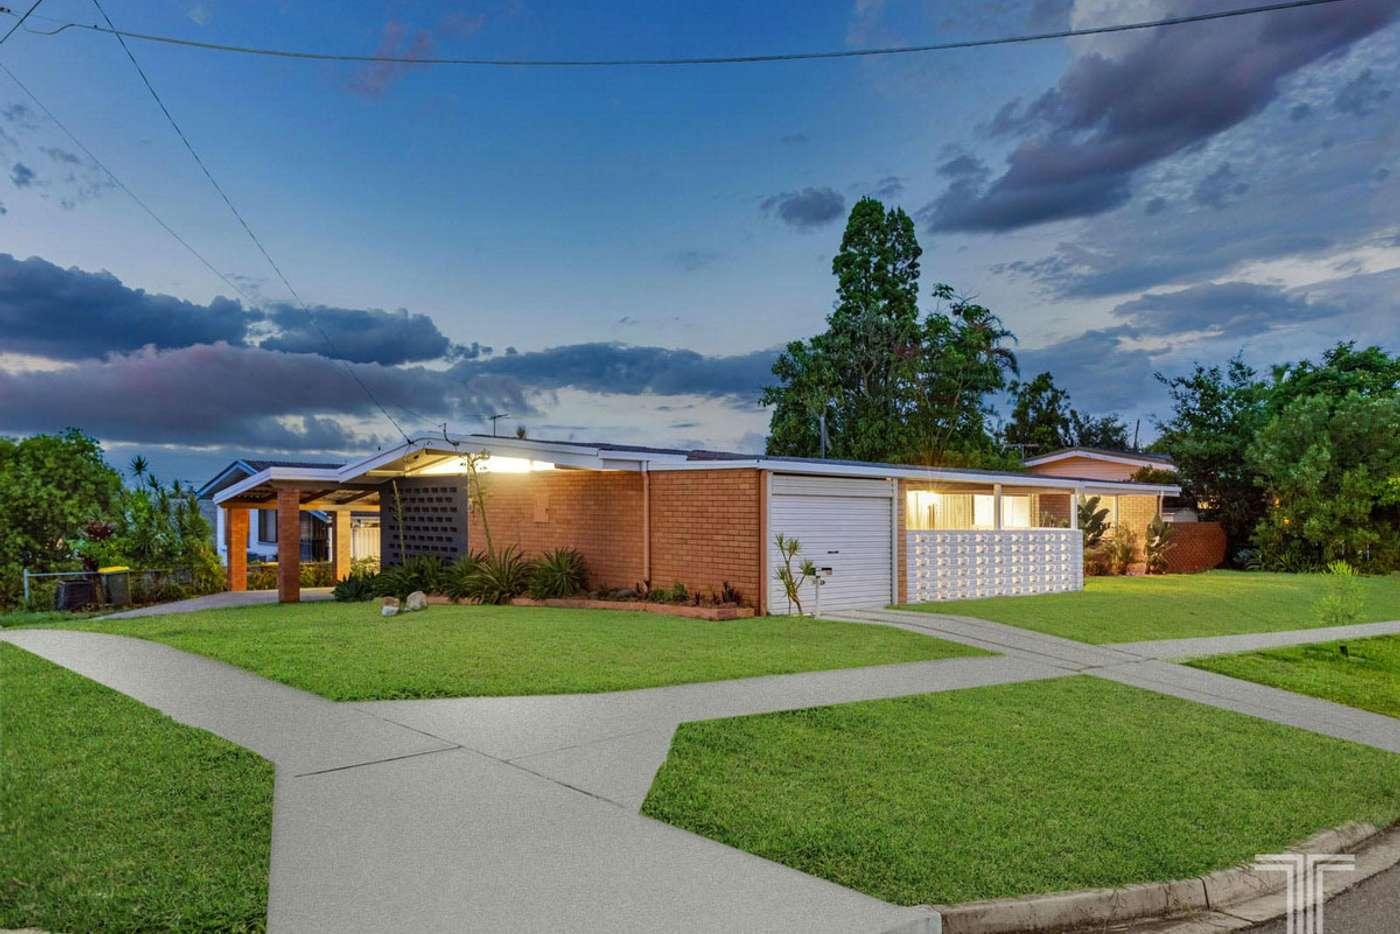 Main view of Homely house listing, 10 Hillcroft Street, Mount Gravatt East QLD 4122